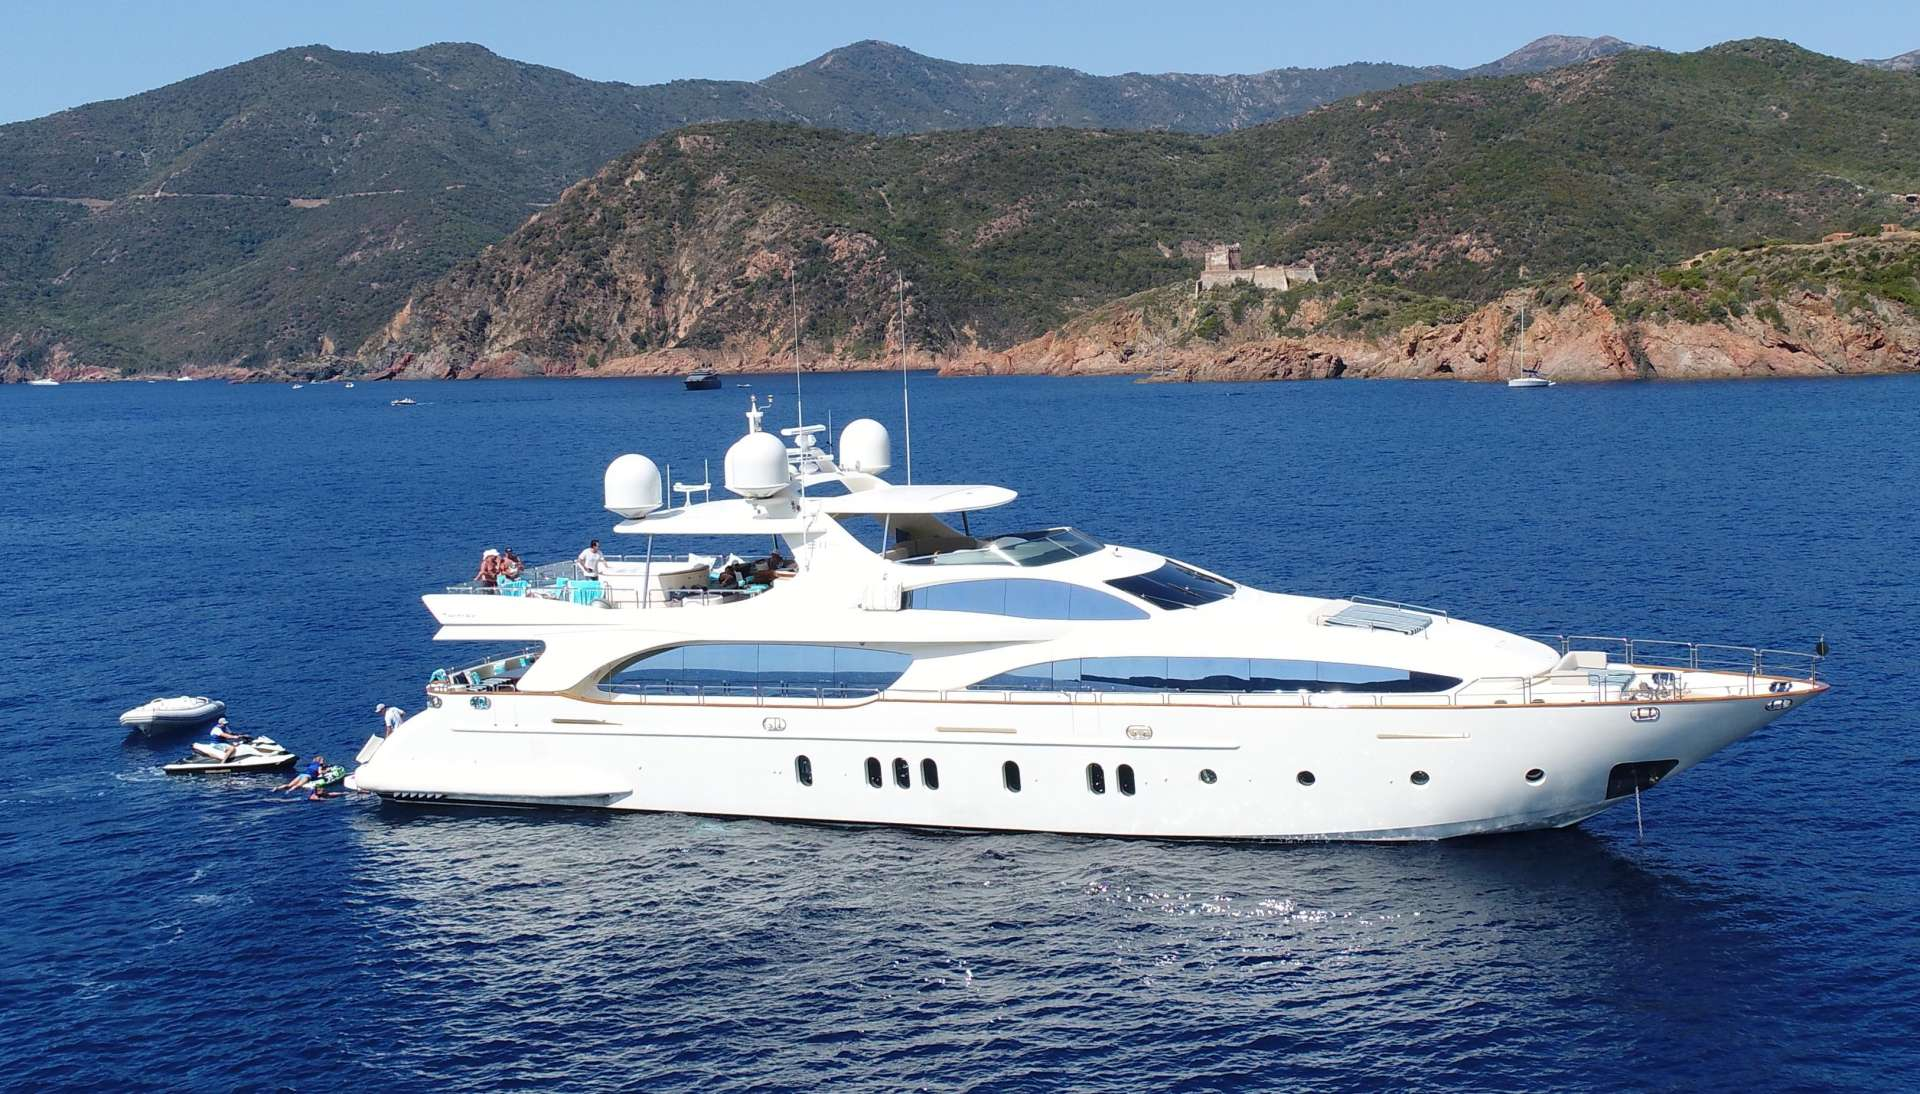 Main image of Sweet Emocean yacht